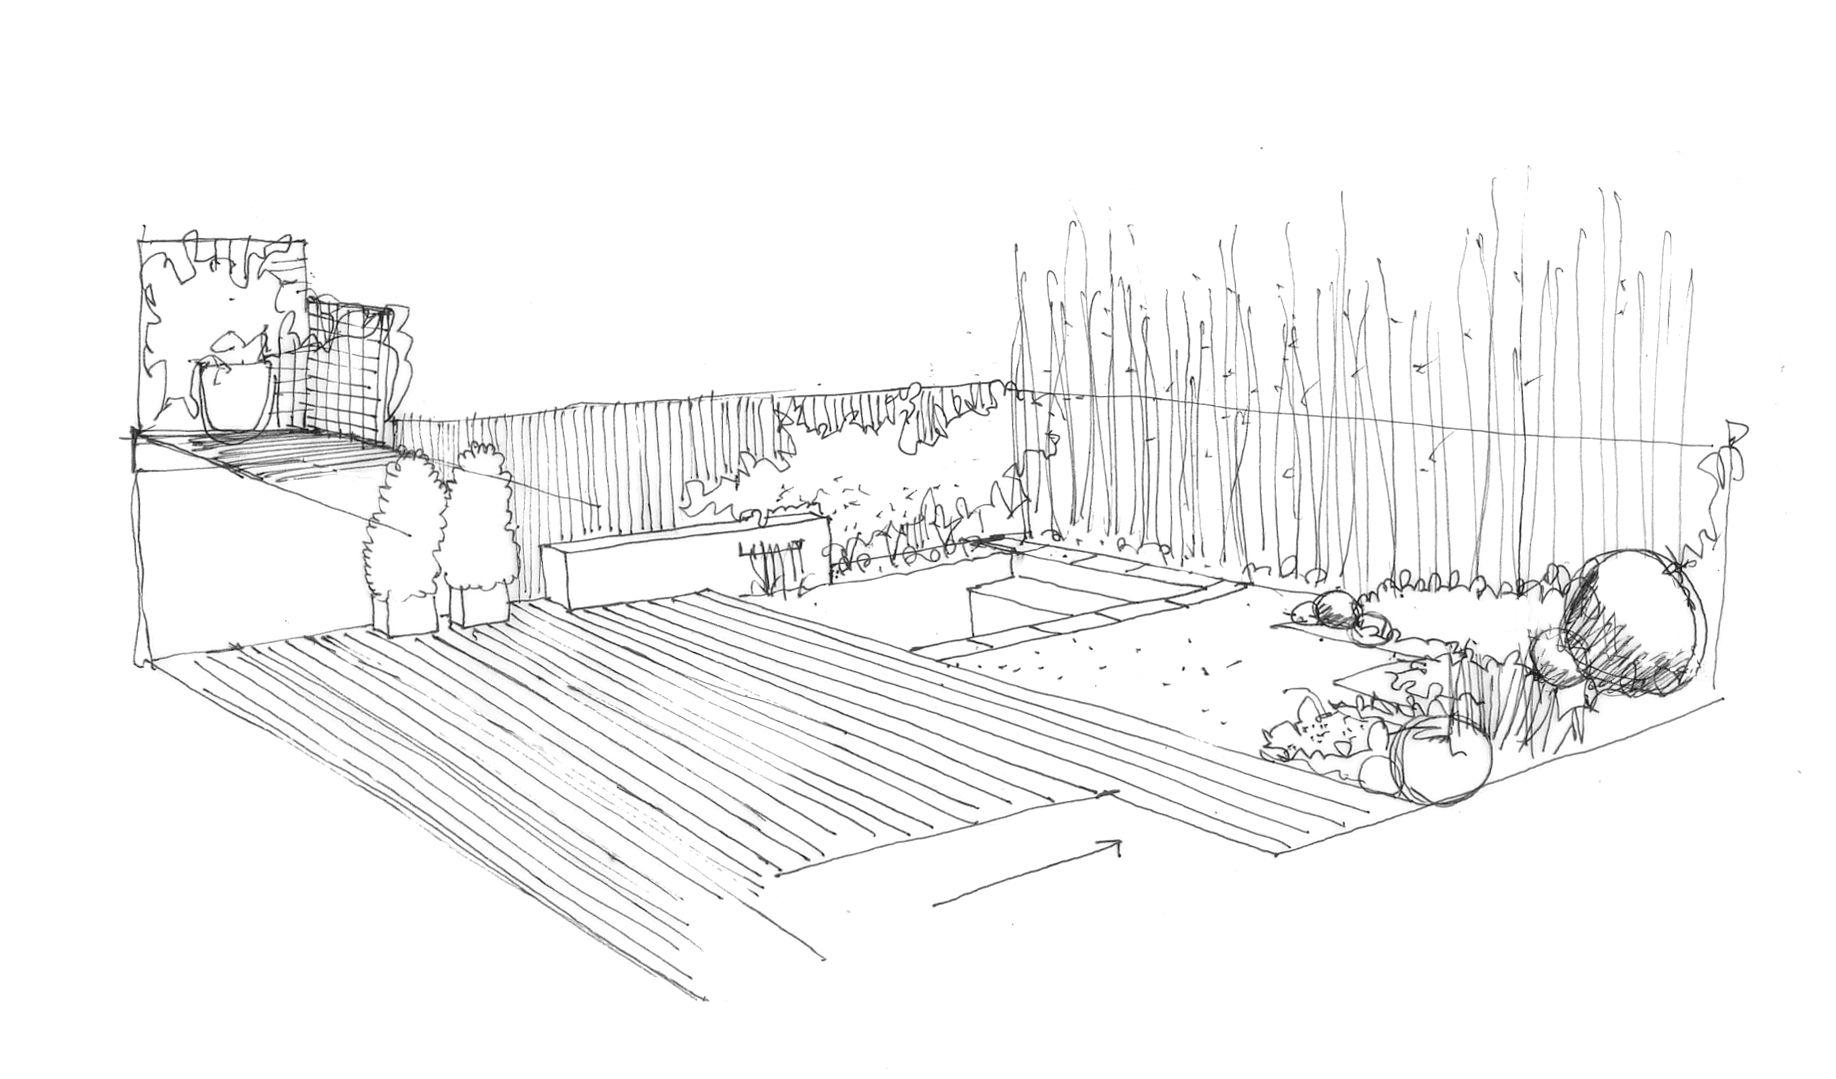 Croquis De Diseno De Jardin Con Piscina Plan Sketch Architecture Drawing House Landscape